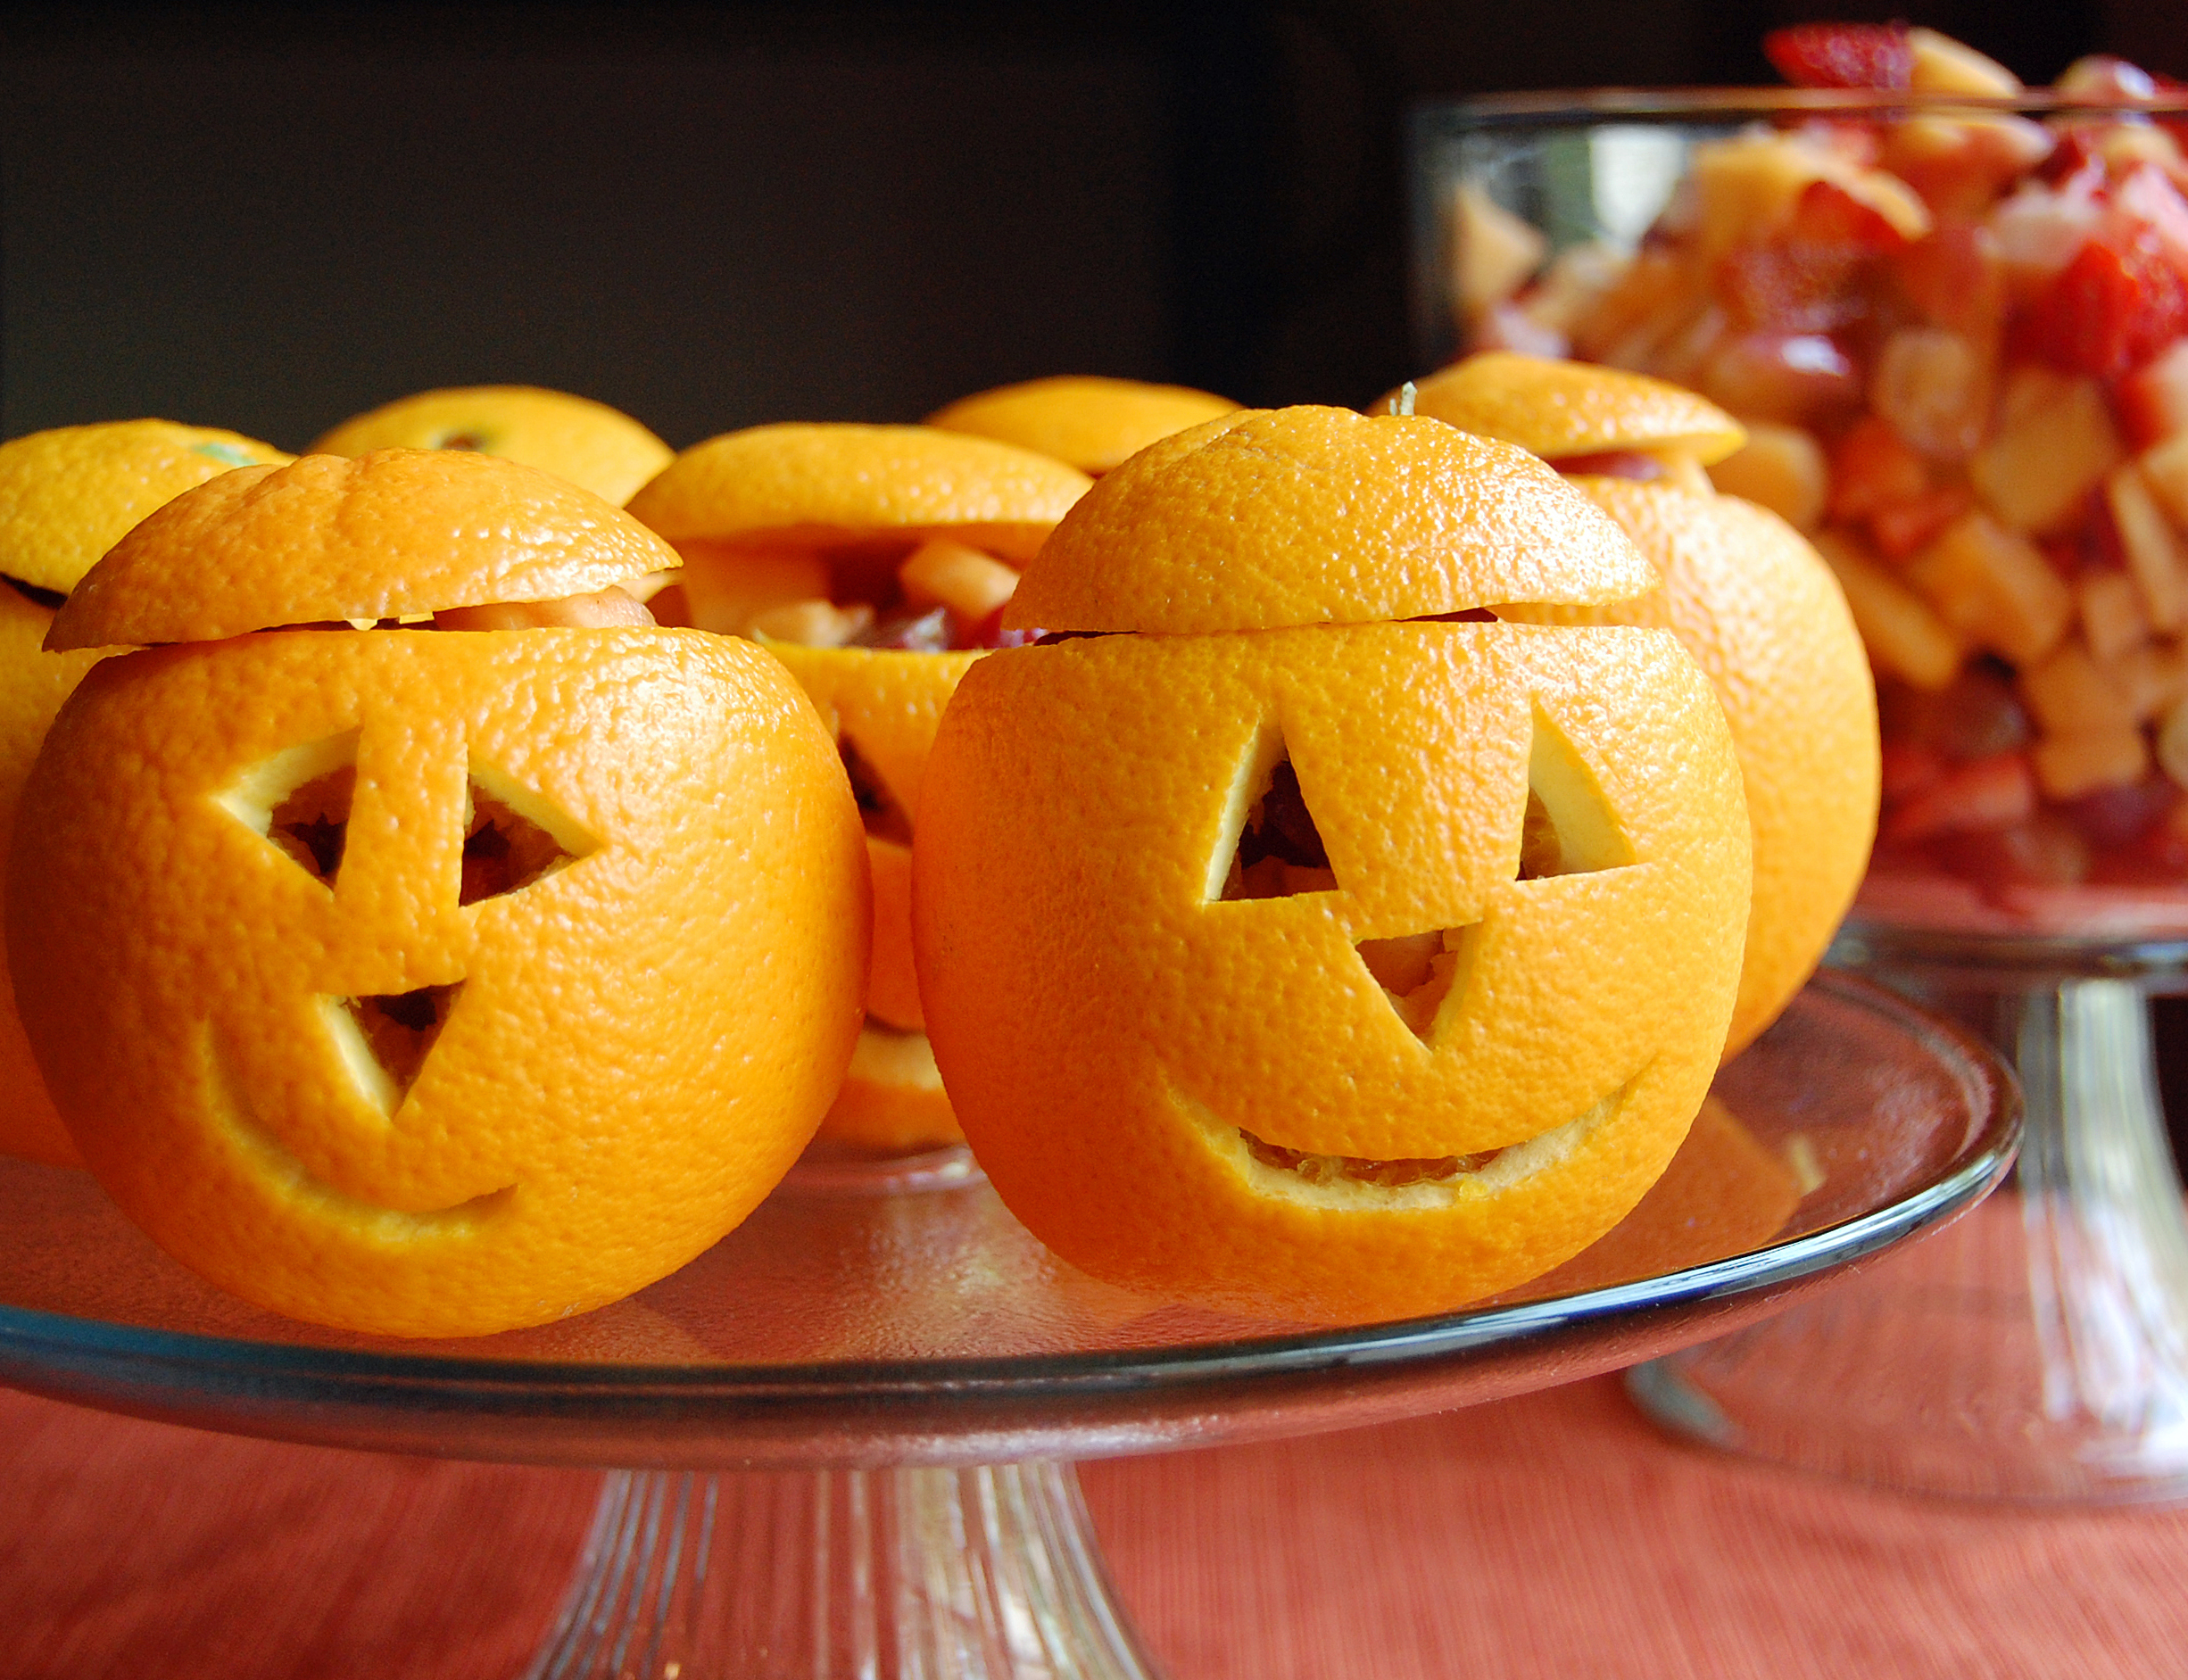 Snack O' Lantern Fruit Cups